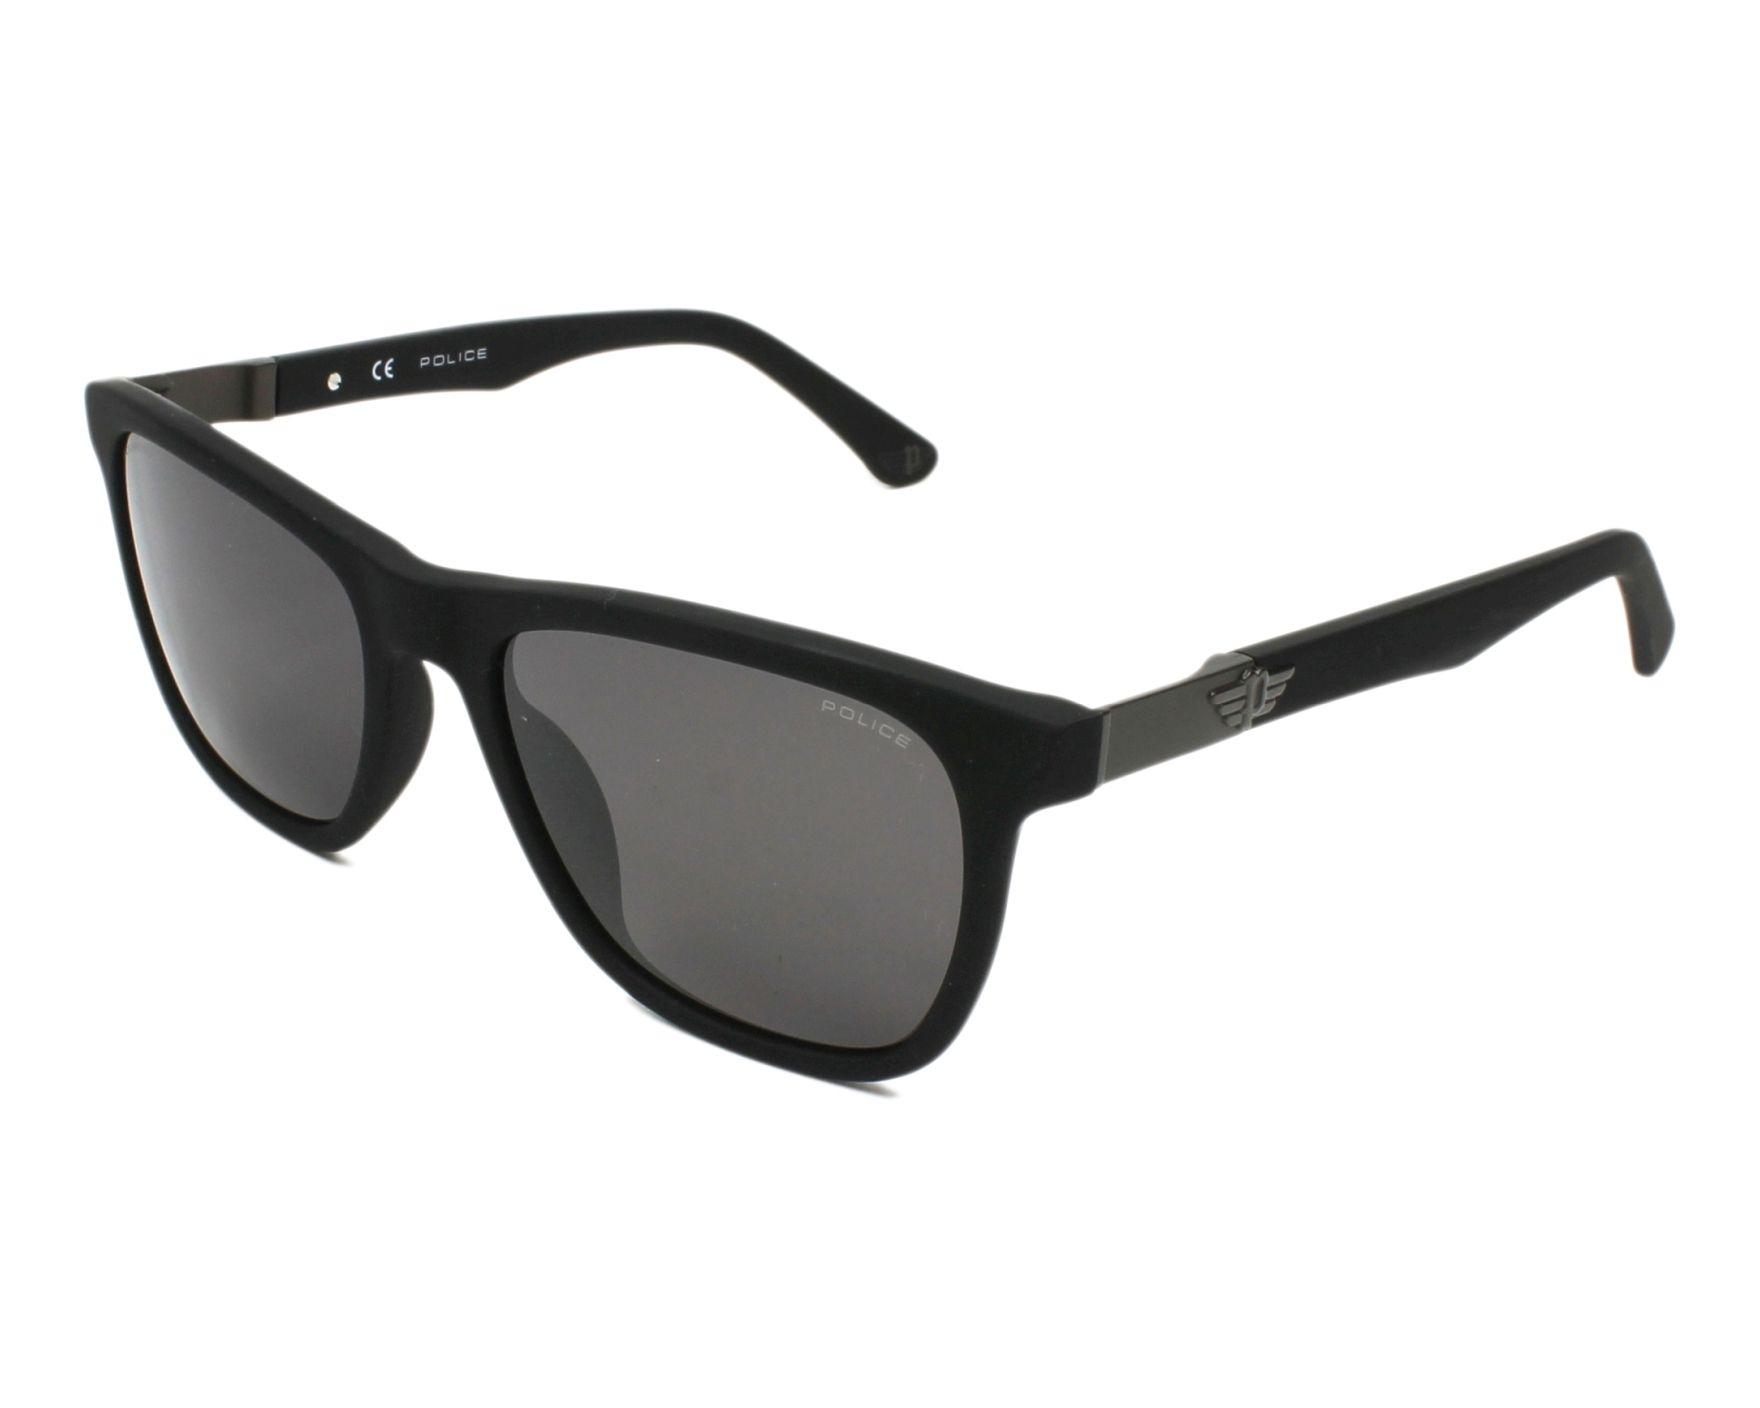 lunettes de soleil block 1 de police en spl 493 703p. Black Bedroom Furniture Sets. Home Design Ideas